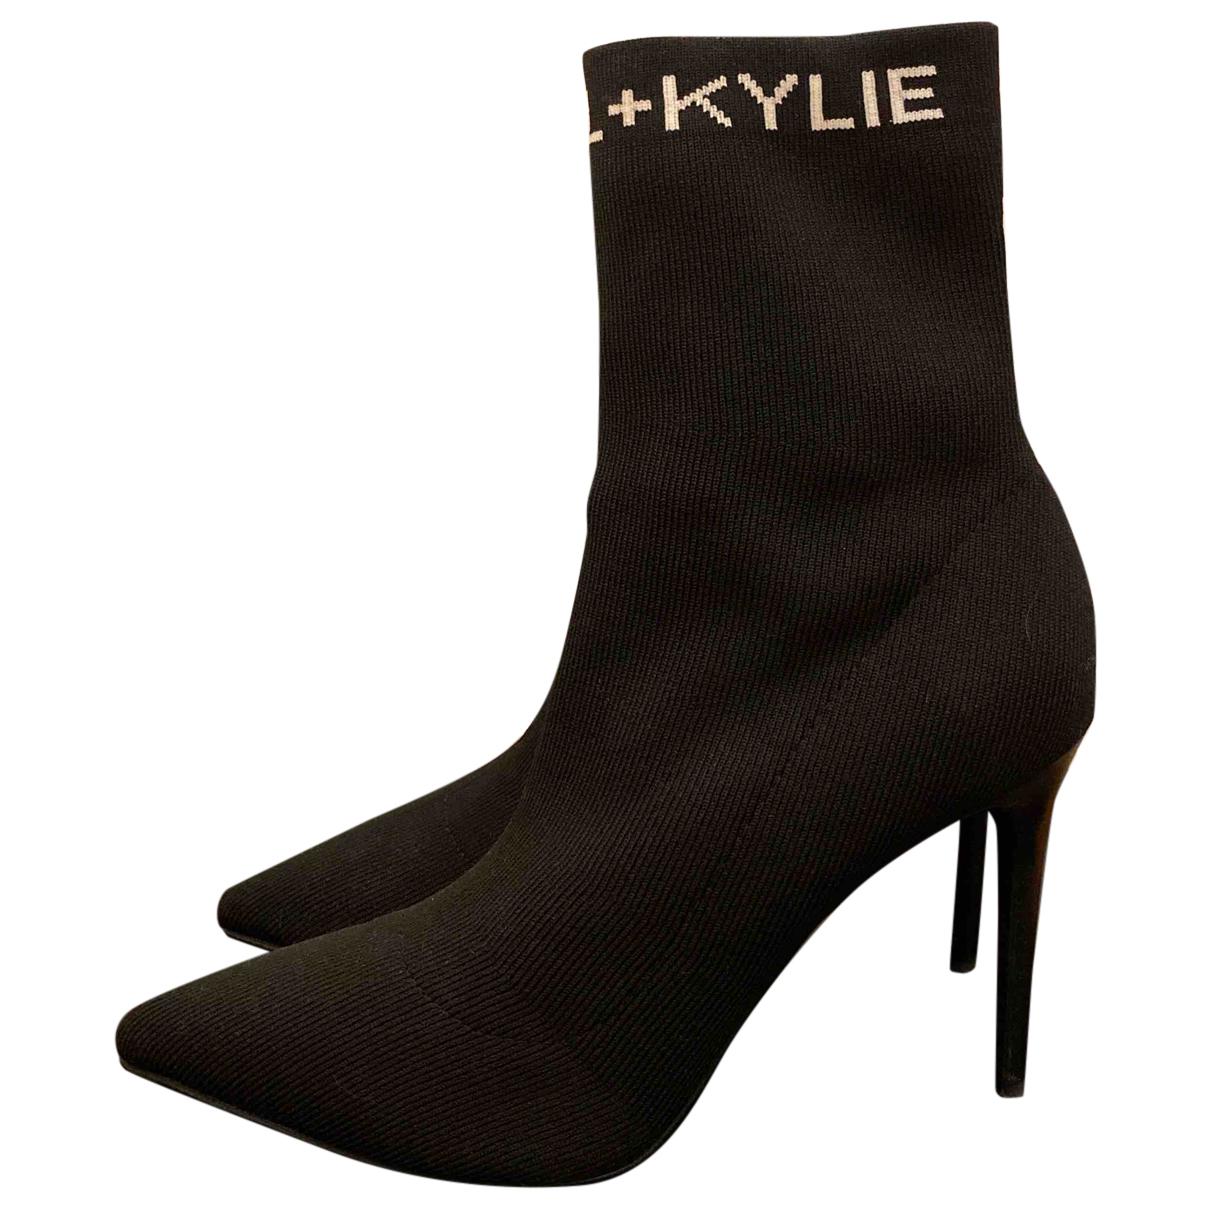 Tacones de Lona Kendall + Kylie